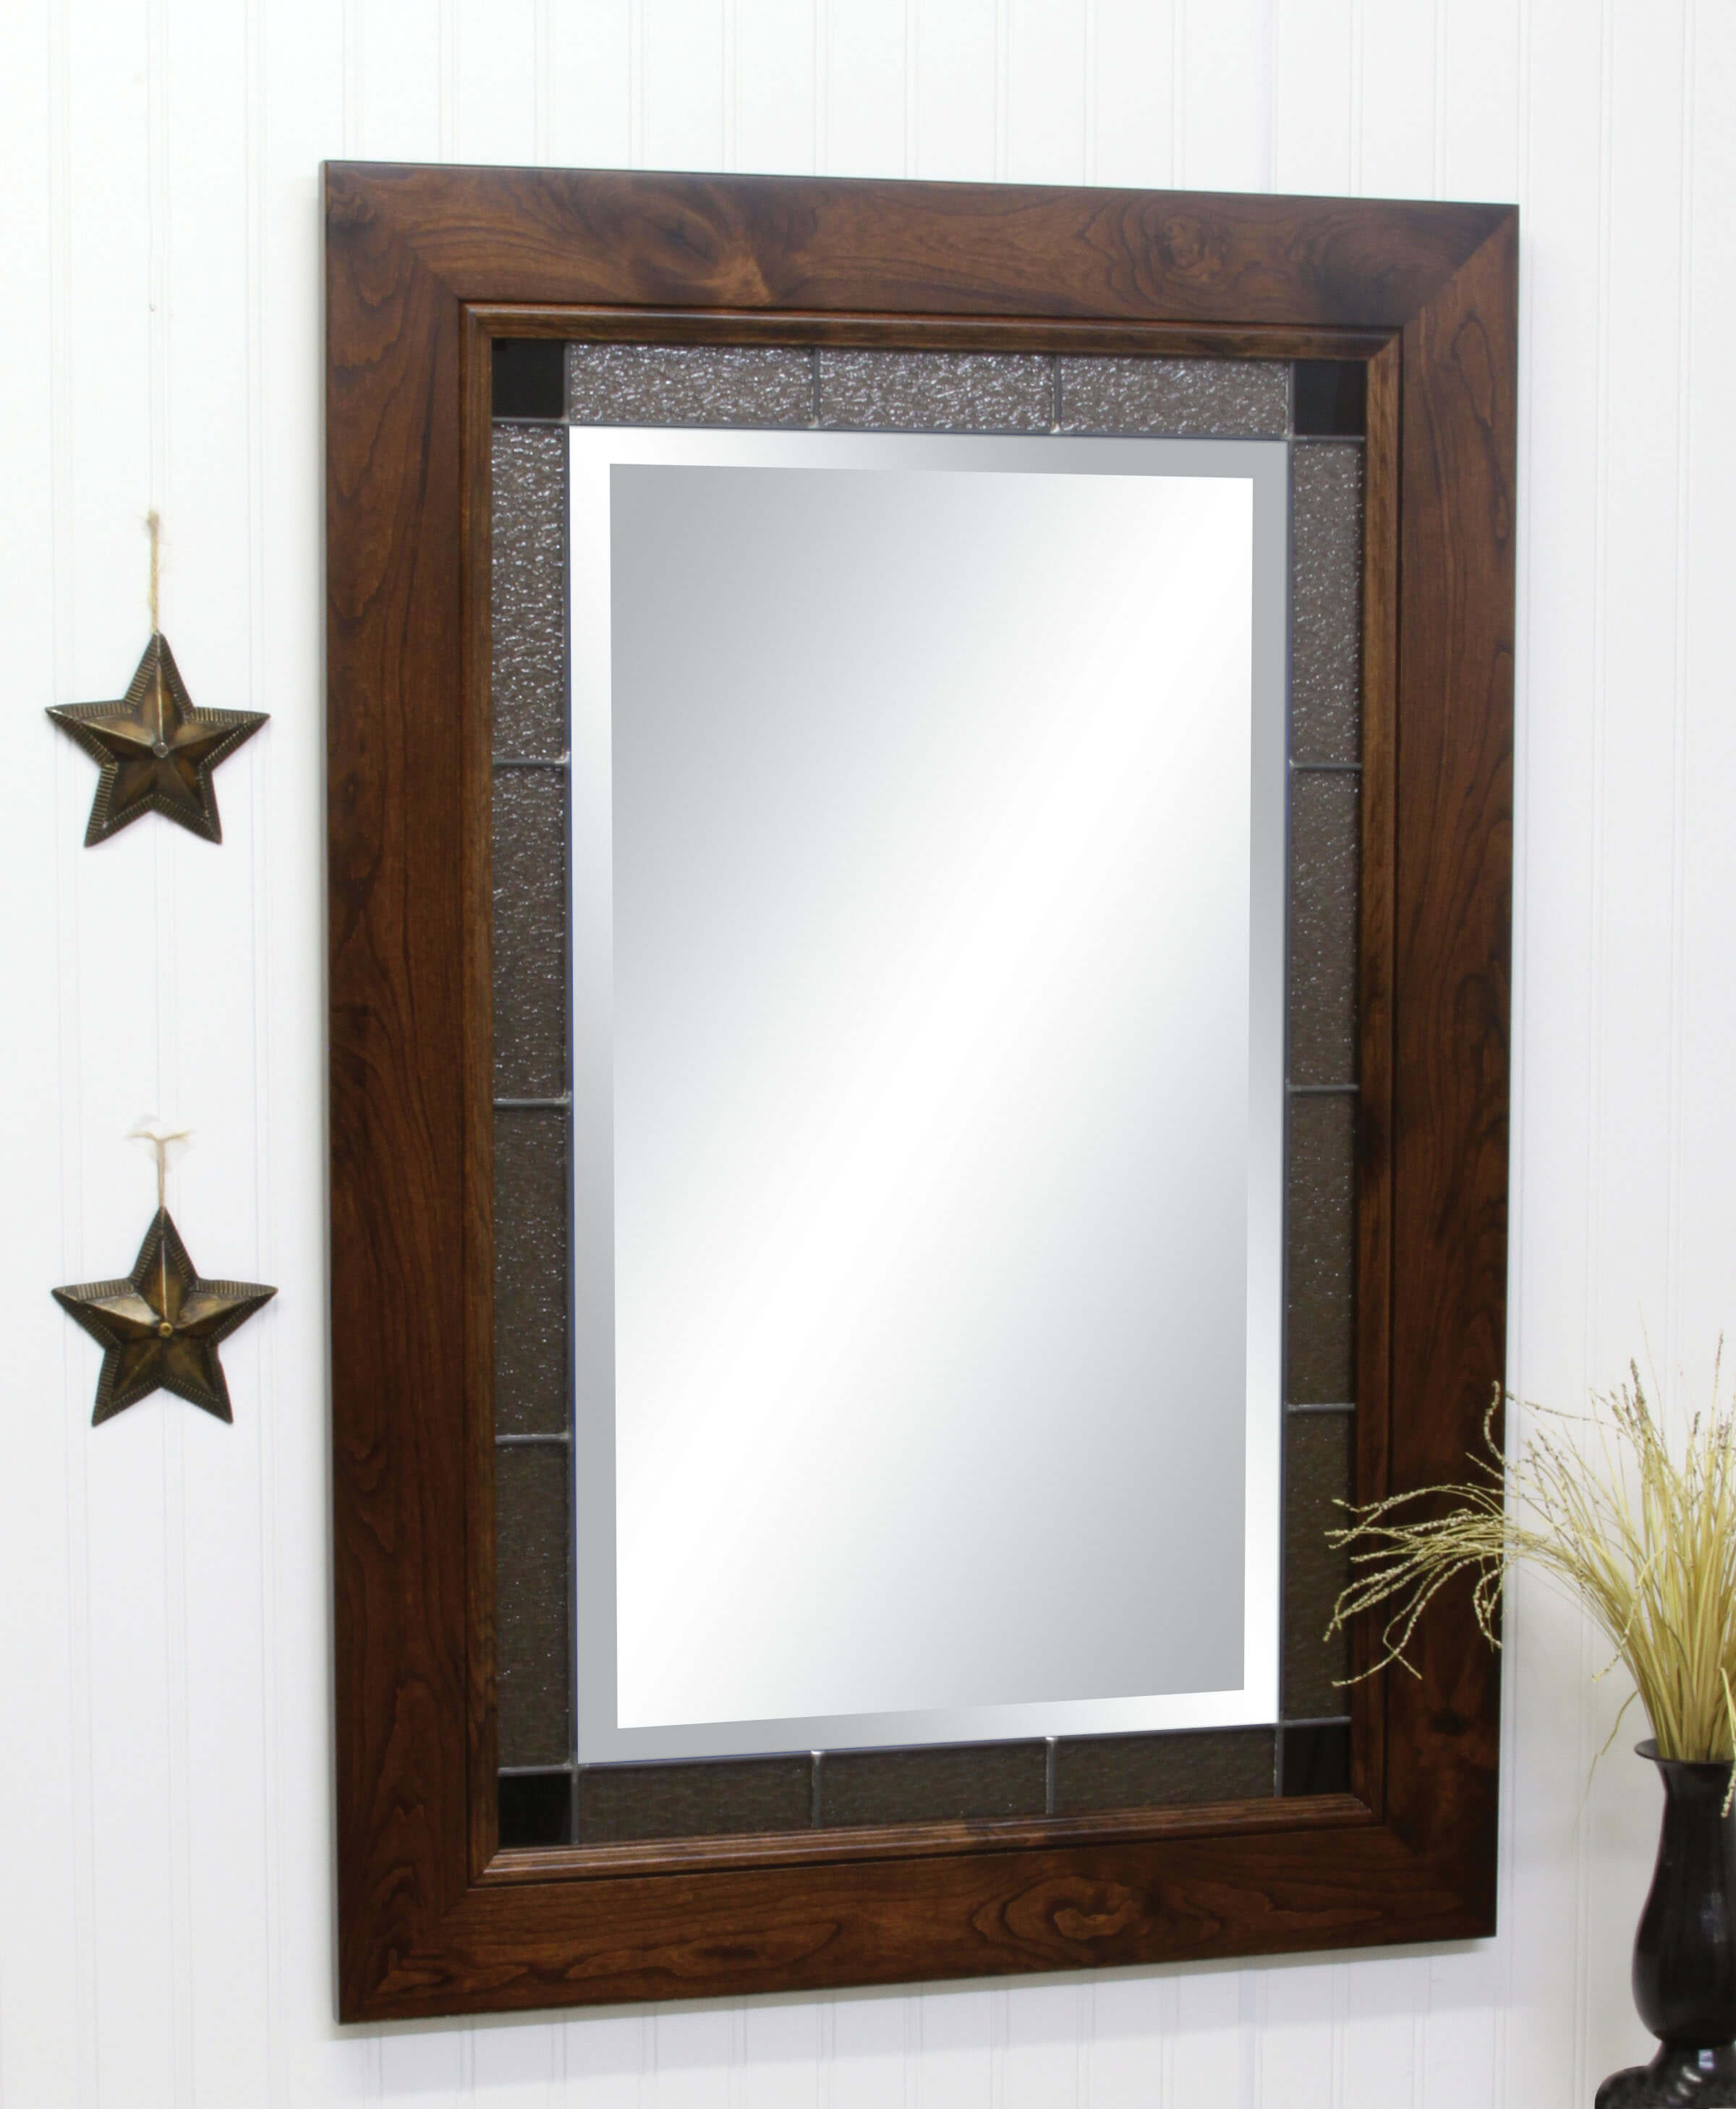 Brooklyn Shaker Wall Mirror